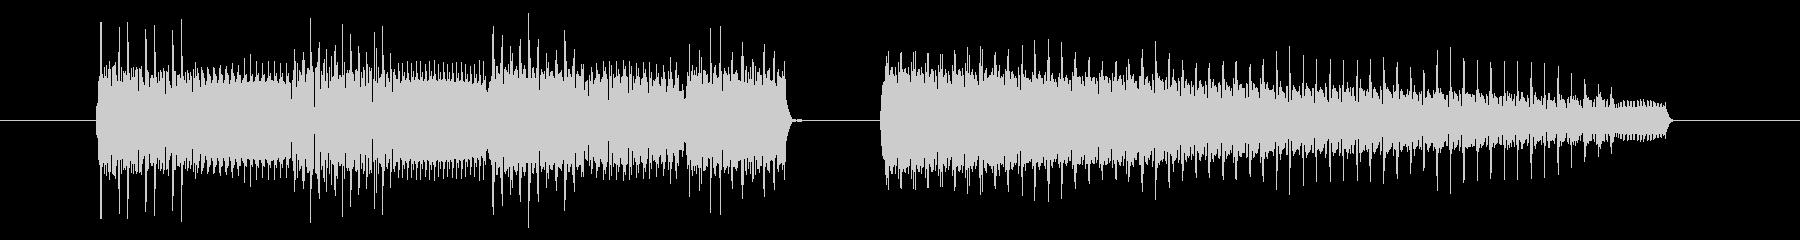 GB系風和風ゲームのジングルの未再生の波形